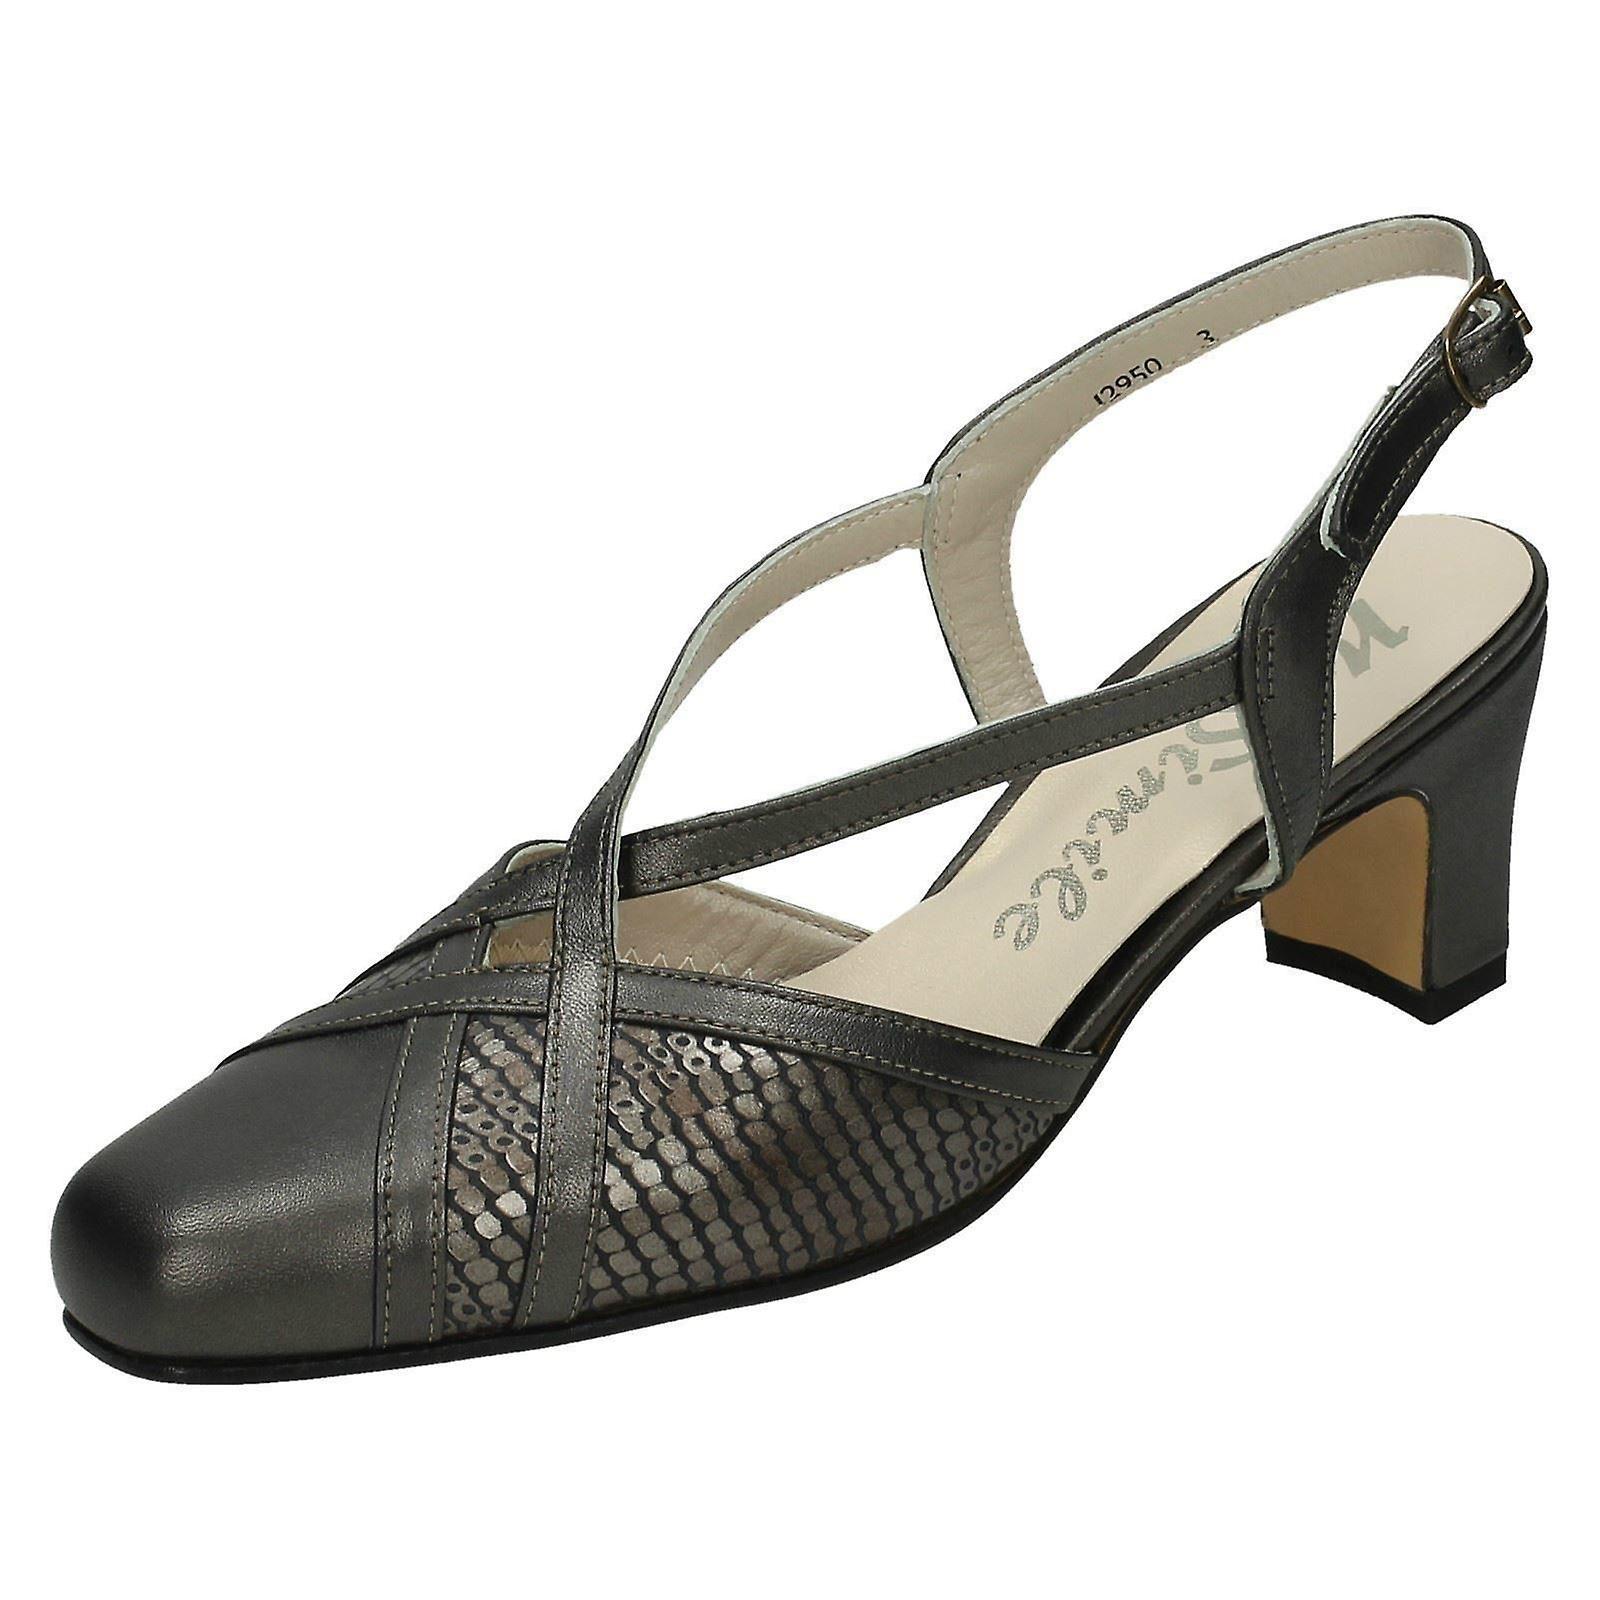 Ladies Nil Simile Narrow Fitting Formal Shoes Bandana HGVWO